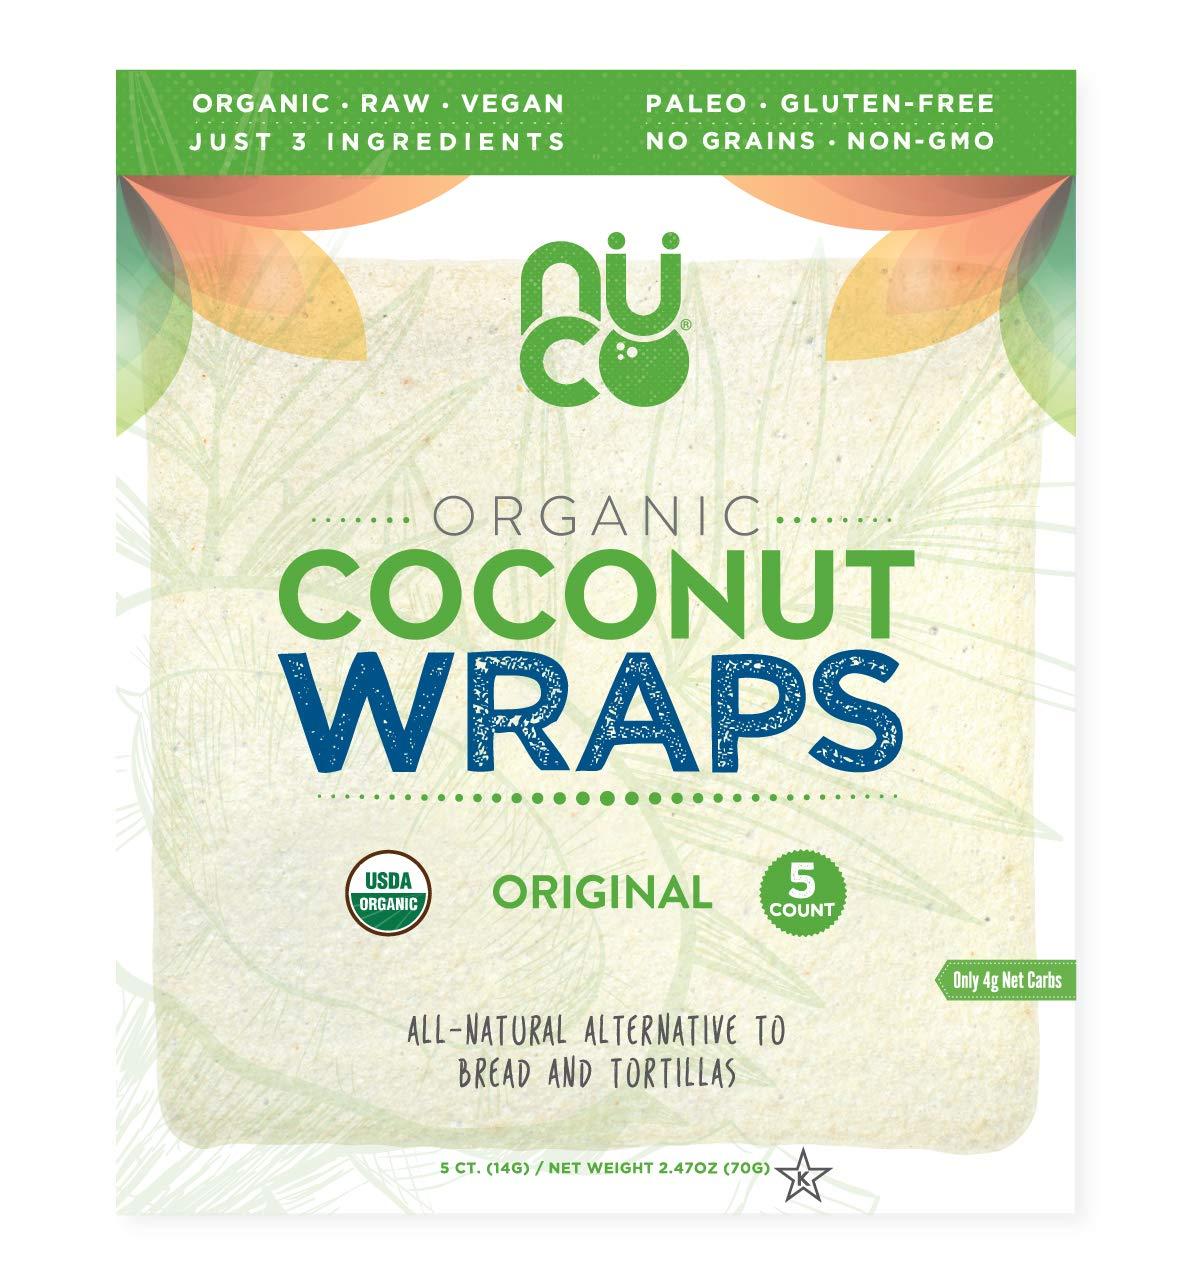 NUCO Certified ORGANIC Paleo Gluten Free Vegan Coconut Wraps, 5 Wraps, 2.47 oz